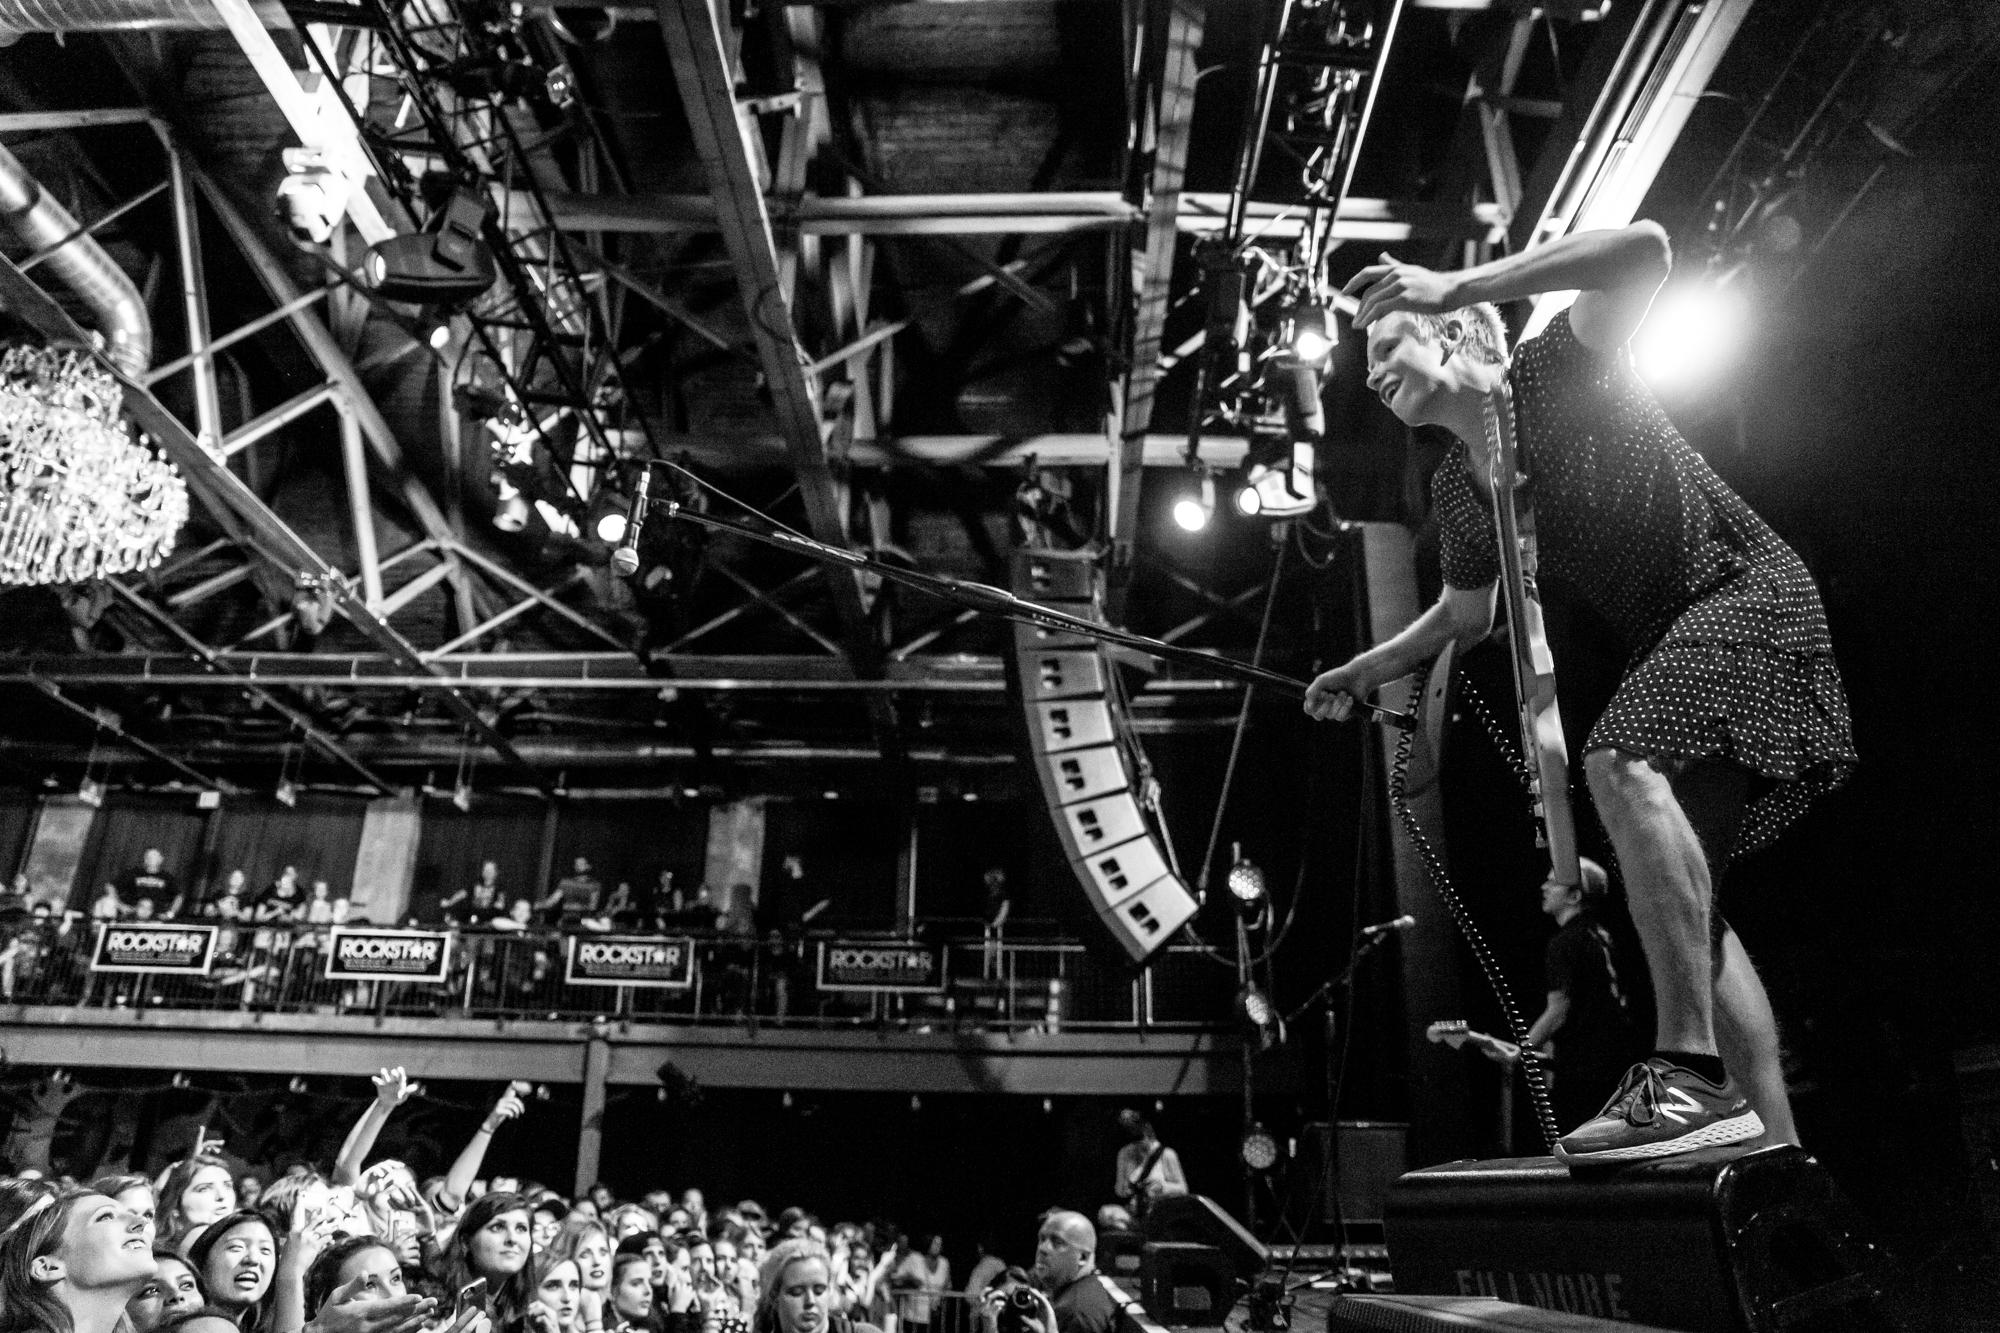 PHOTOS: SWMRS put on unforgettable show in Philadelphia